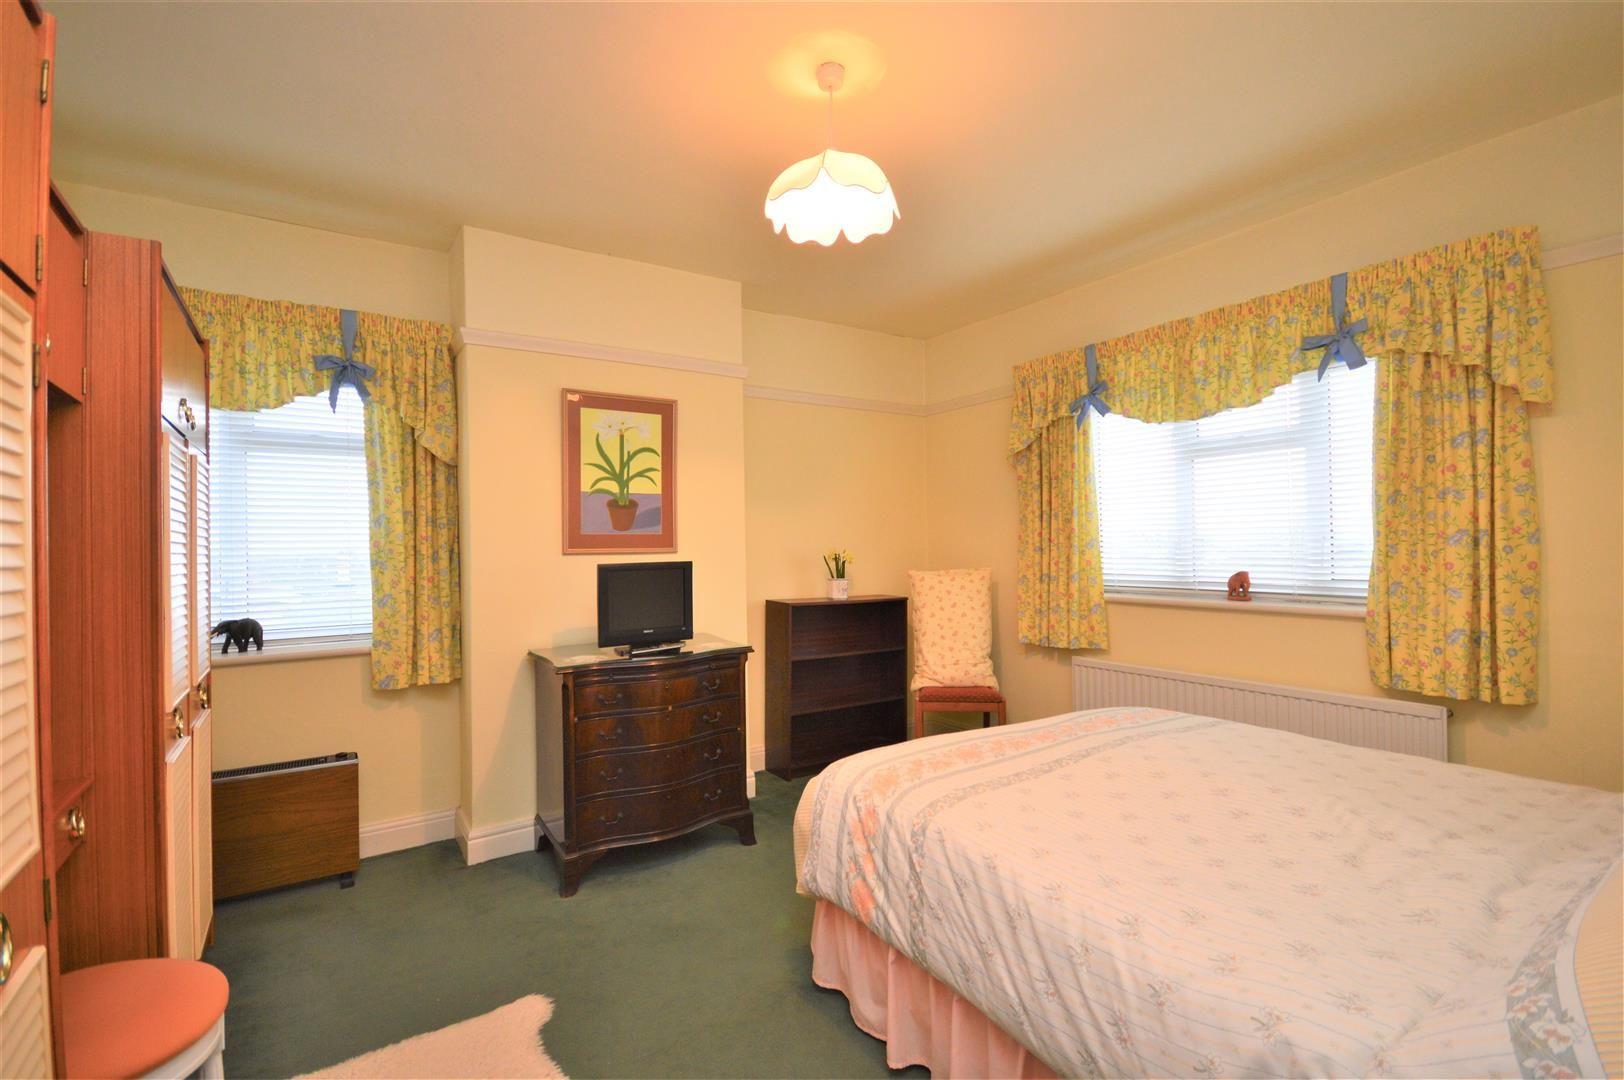 4 bed detached for sale in Bobblestock 14